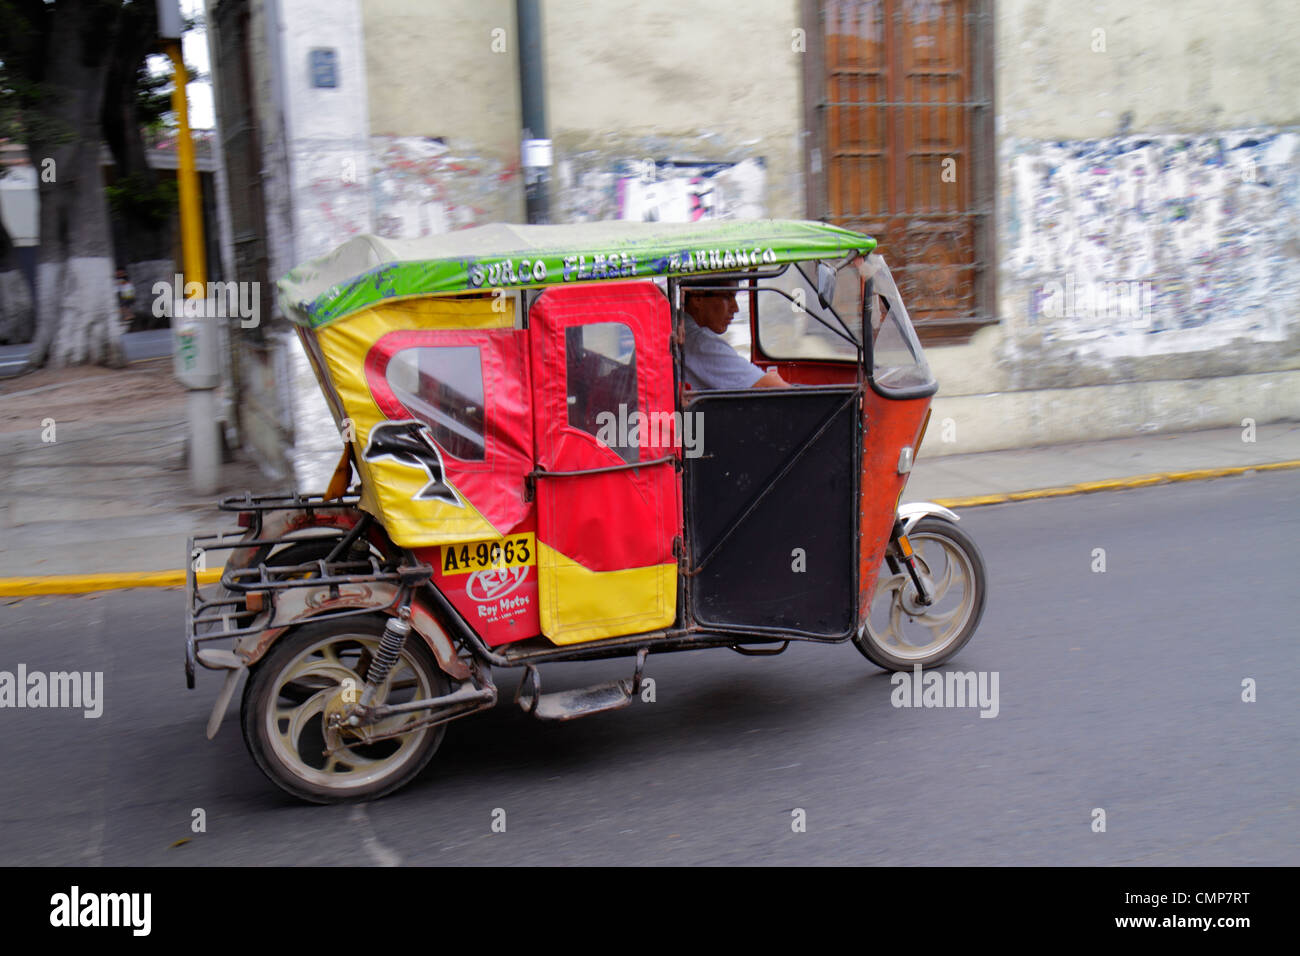 Lima Pérou Barranco District Avenida Pedro d'Osma Scène de rue d'autres moyens de transport taxi Photo Stock